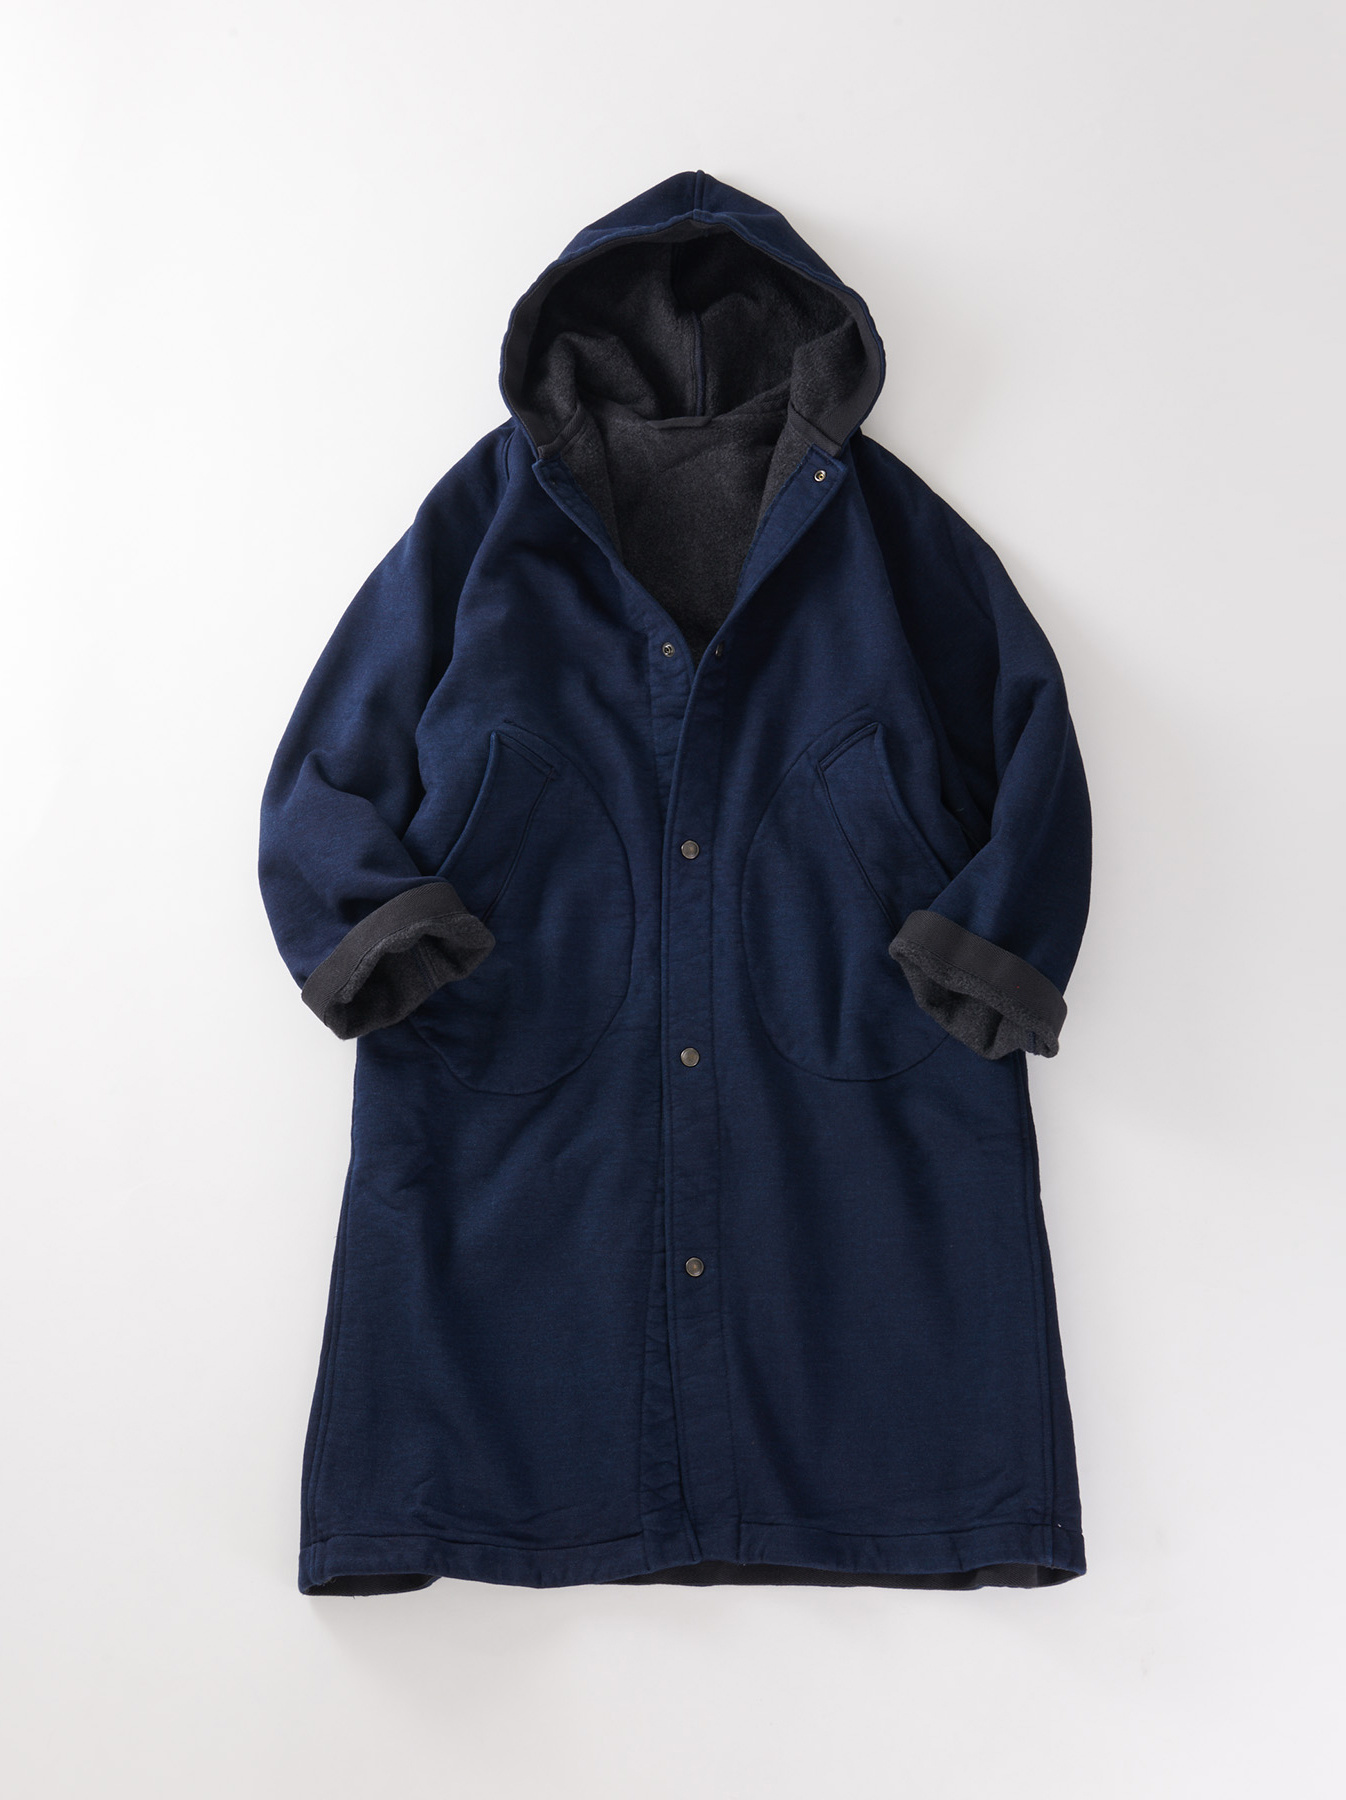 WH Indigo Mouton Fleecy 908 Hoodie Coat-1